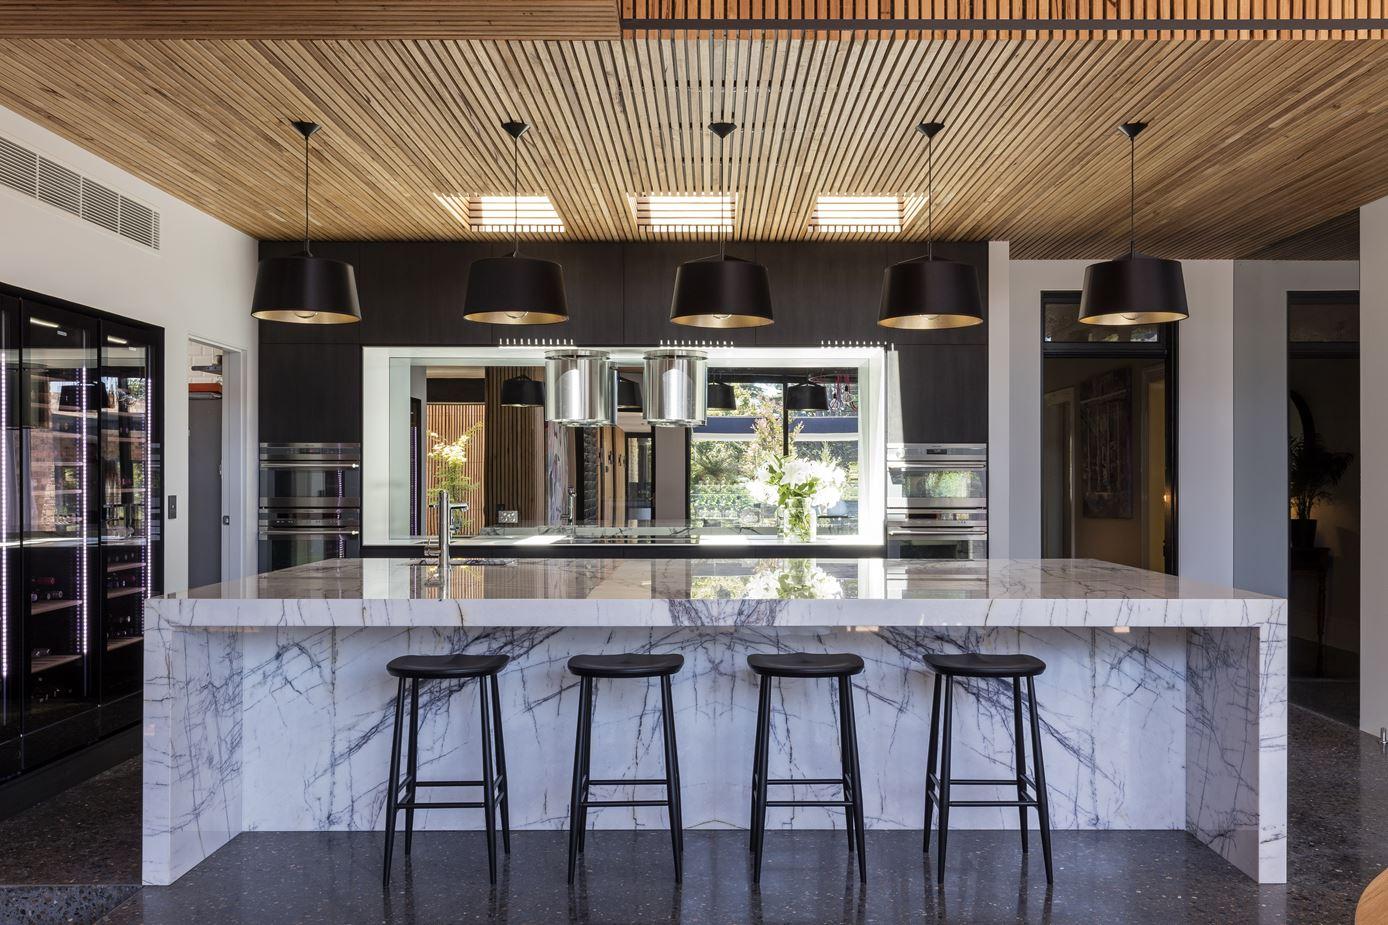 Bowral Australia  city photos gallery : Bundaroo House in Bowral, Australia by Tziallas Omeara Architecture ...